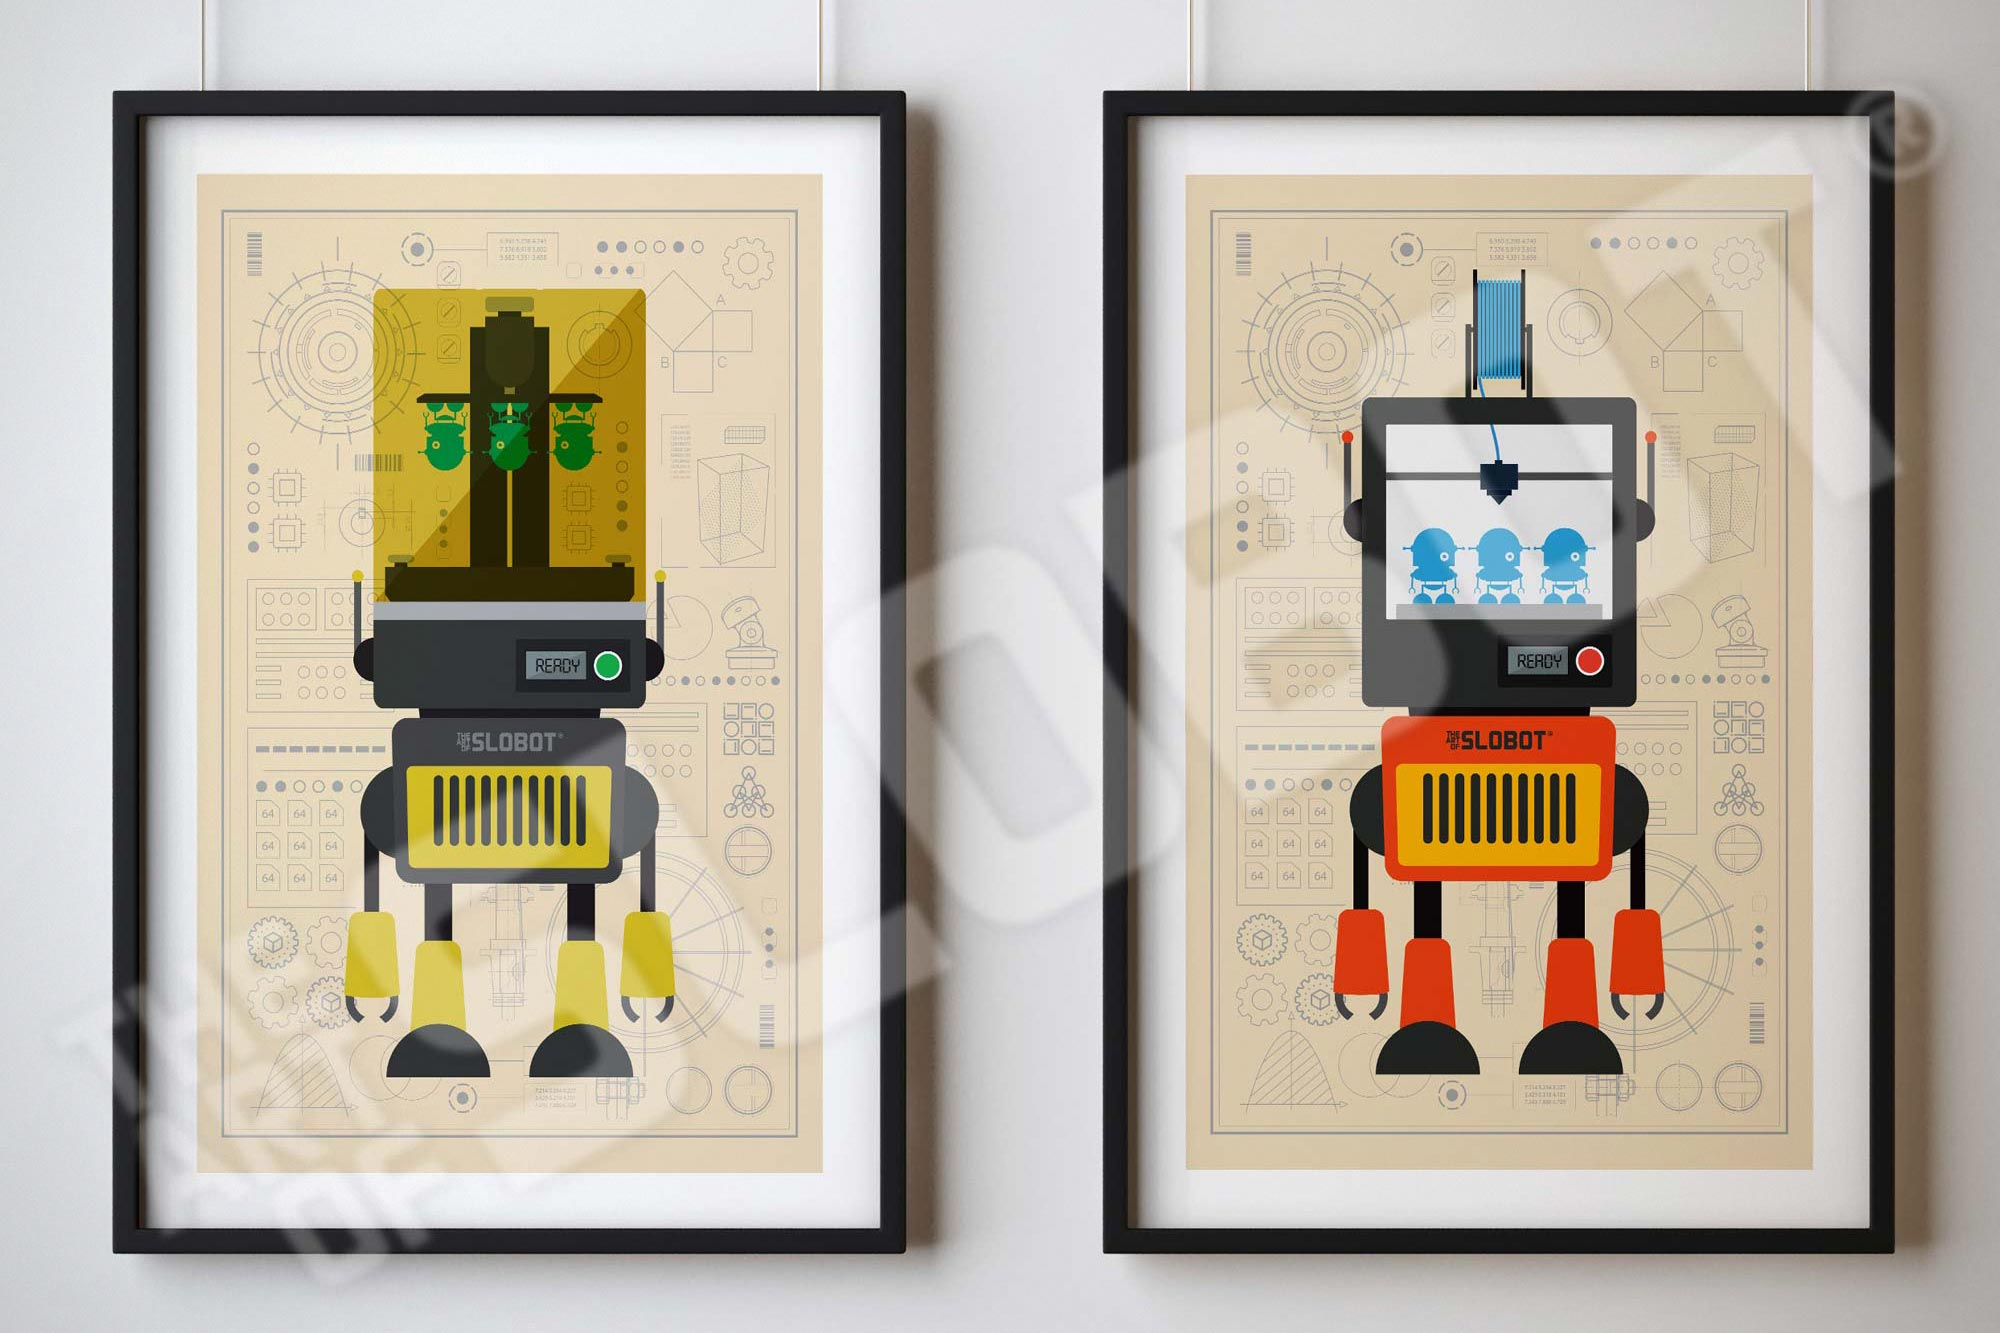 3D Printer Robot Illustration by Mike Slotbot